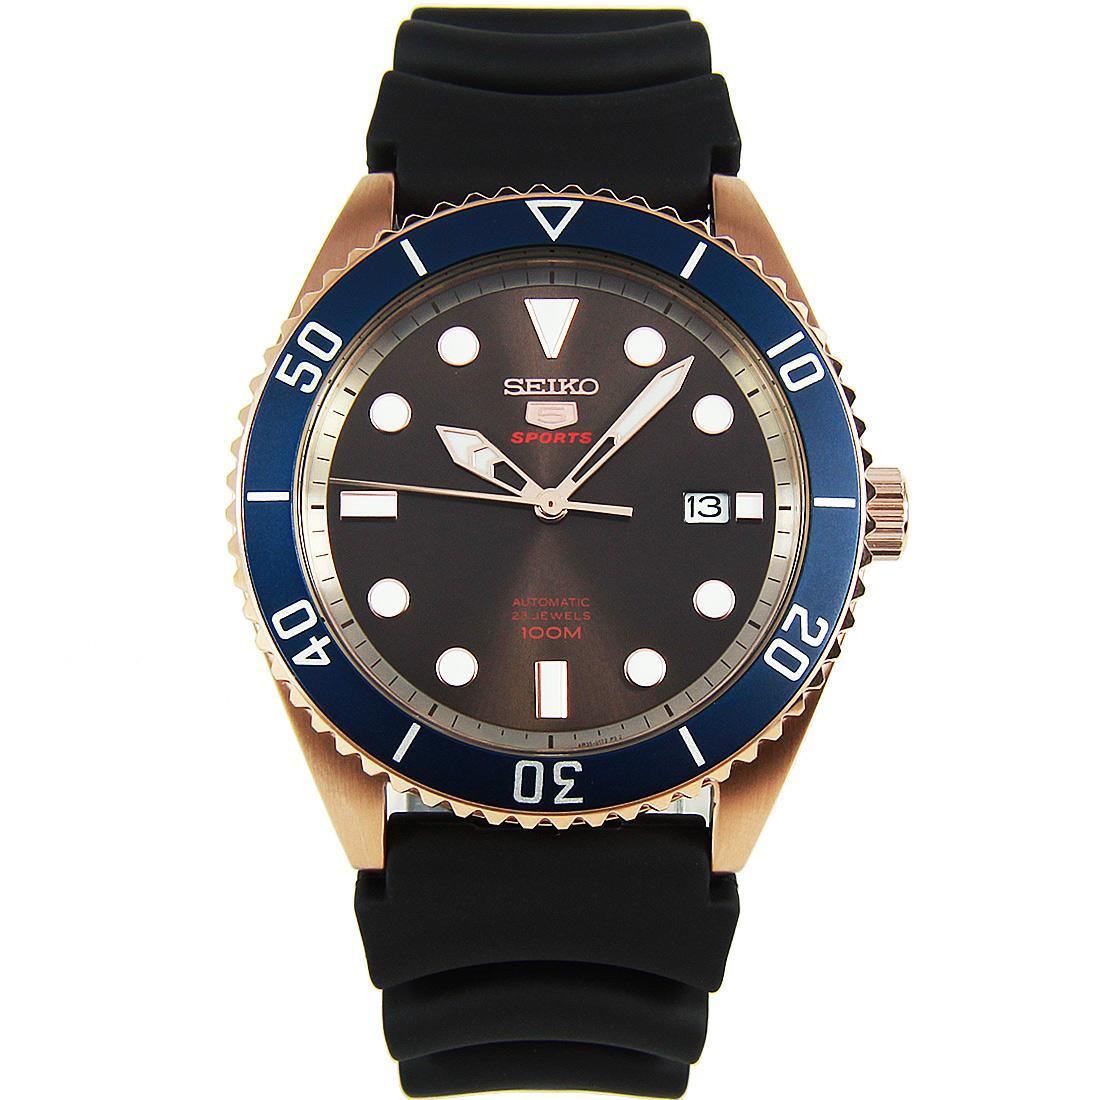 Seiko 5 Sports Automatic Black Silicone Strap Watch SRPB96 SRPB96K1